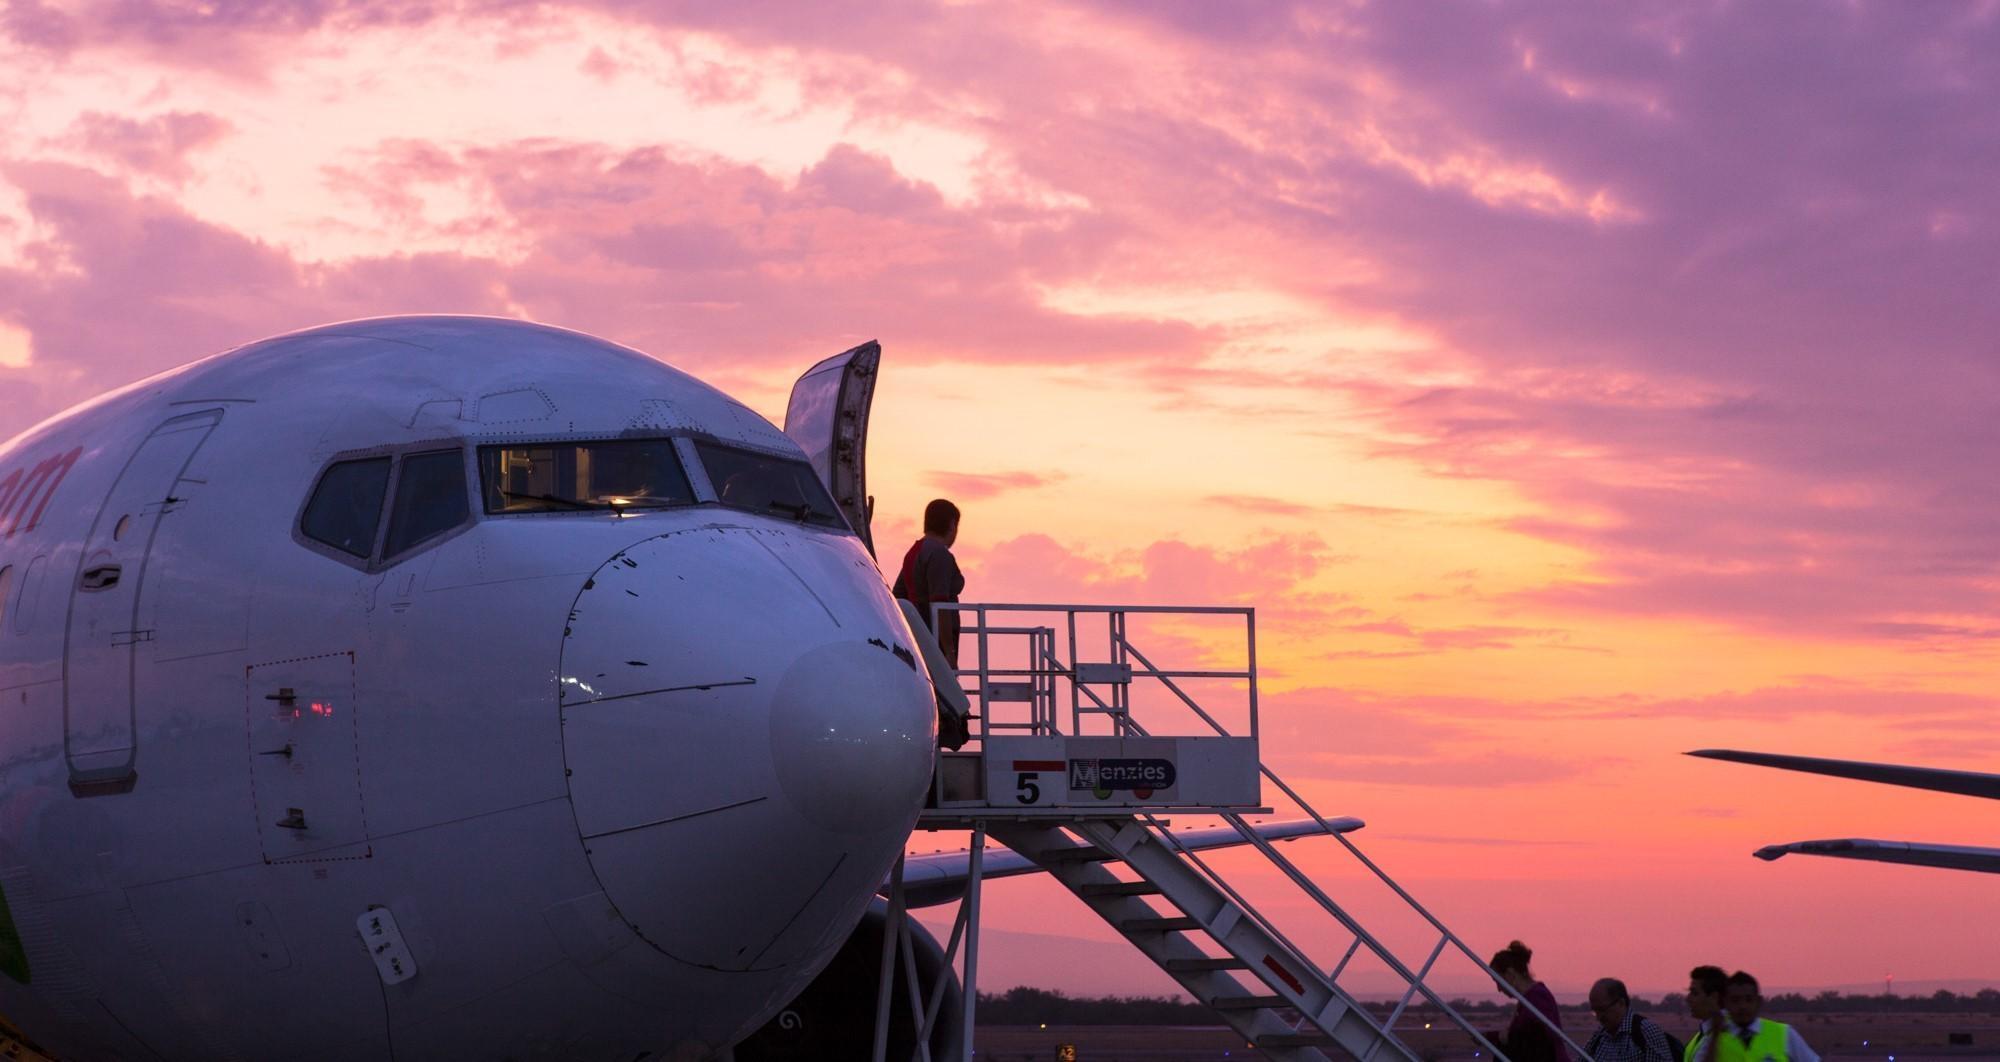 OMA's passenger traffic drops 70%